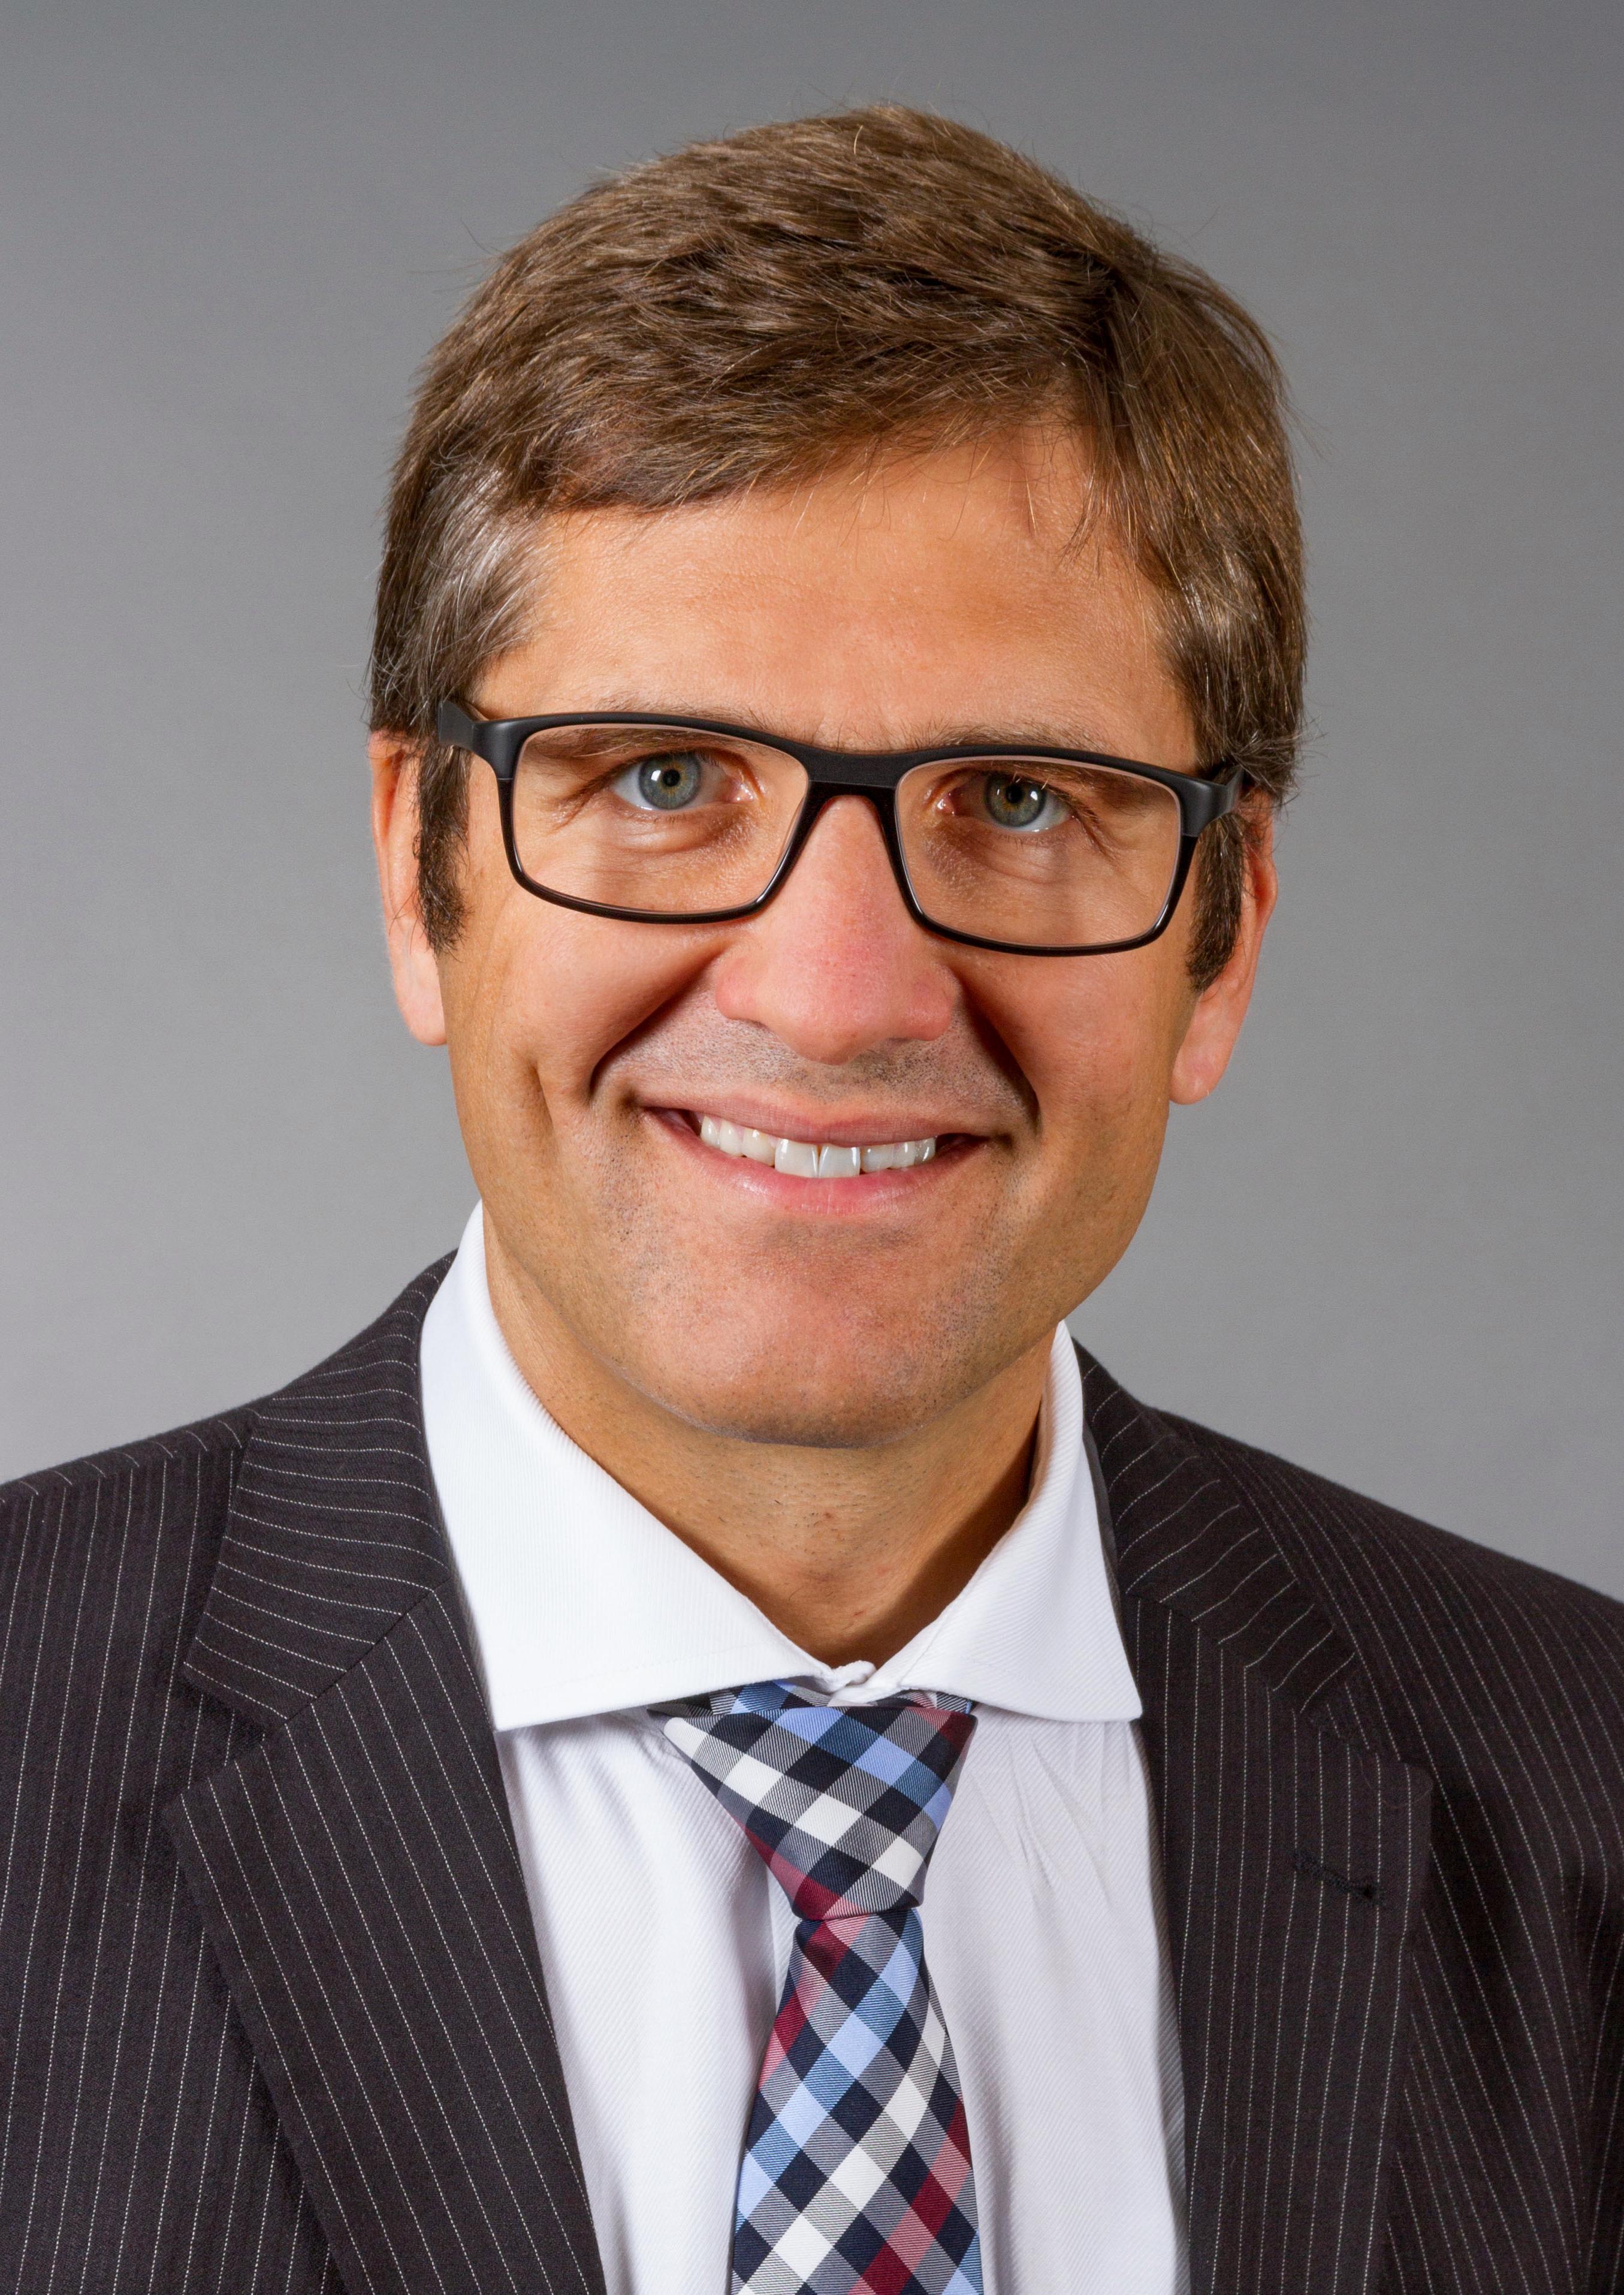 Referent/Referentin: Prof. Dr. Jochen Pilhofer